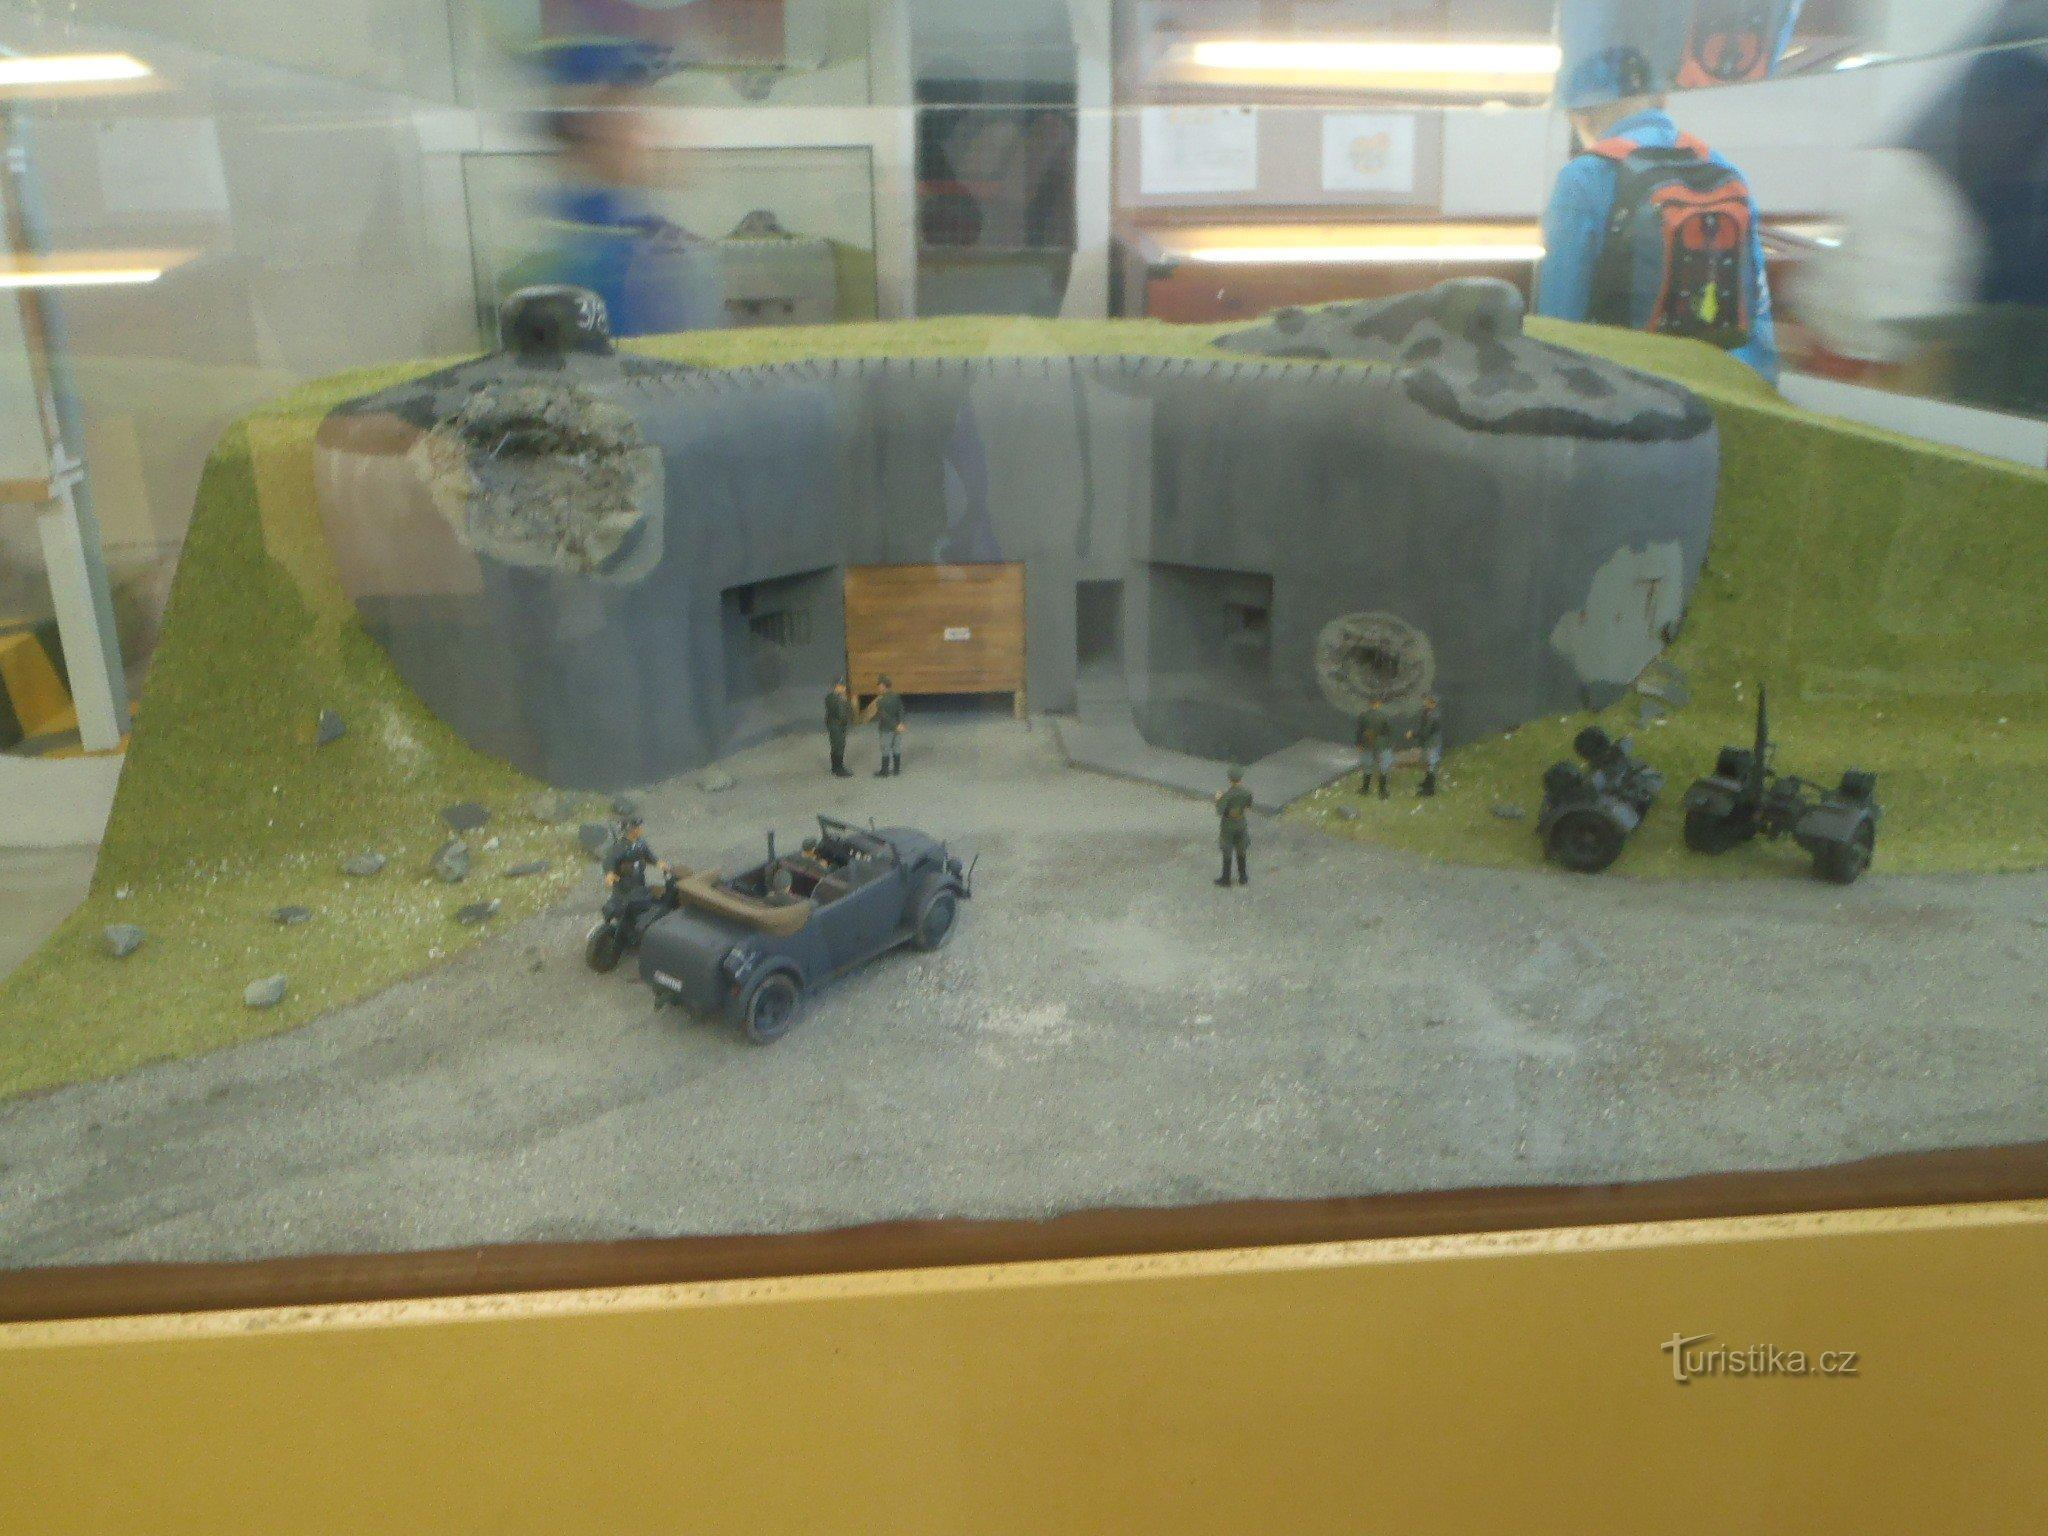 Hanička, prvorepubliková pevnost